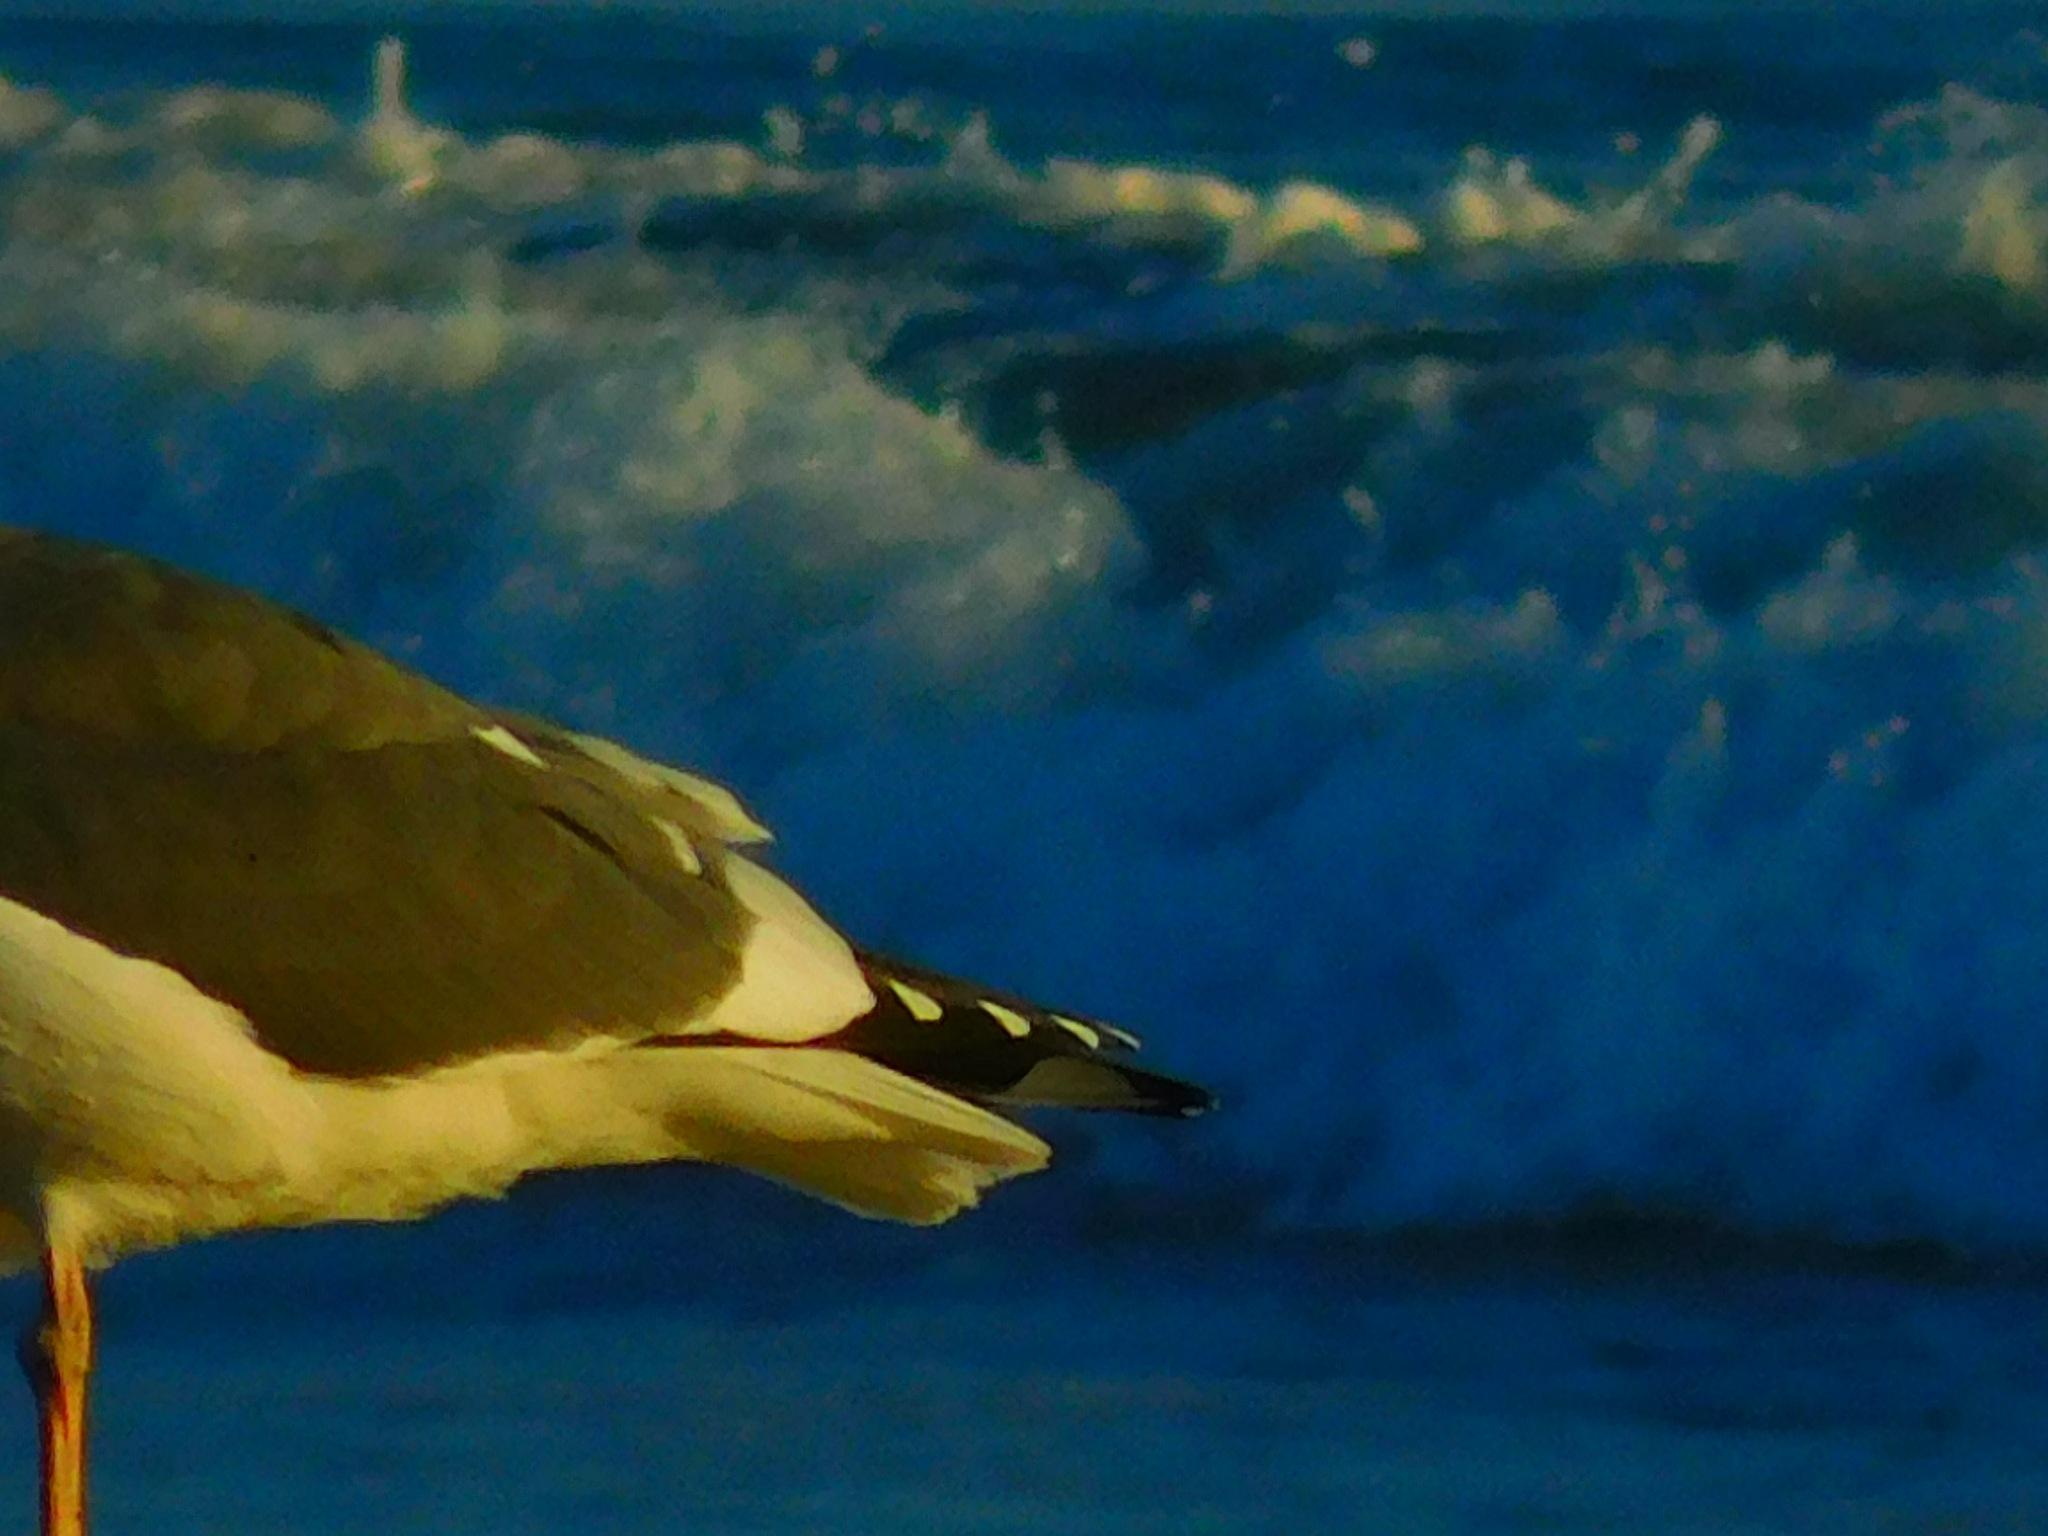 WILD HOGBIRD DOZING...(GMO CHIMERA--Shocking 'Proof Of Escape' / Coast-Capture Snapshot) by SEYMOUR_NAO